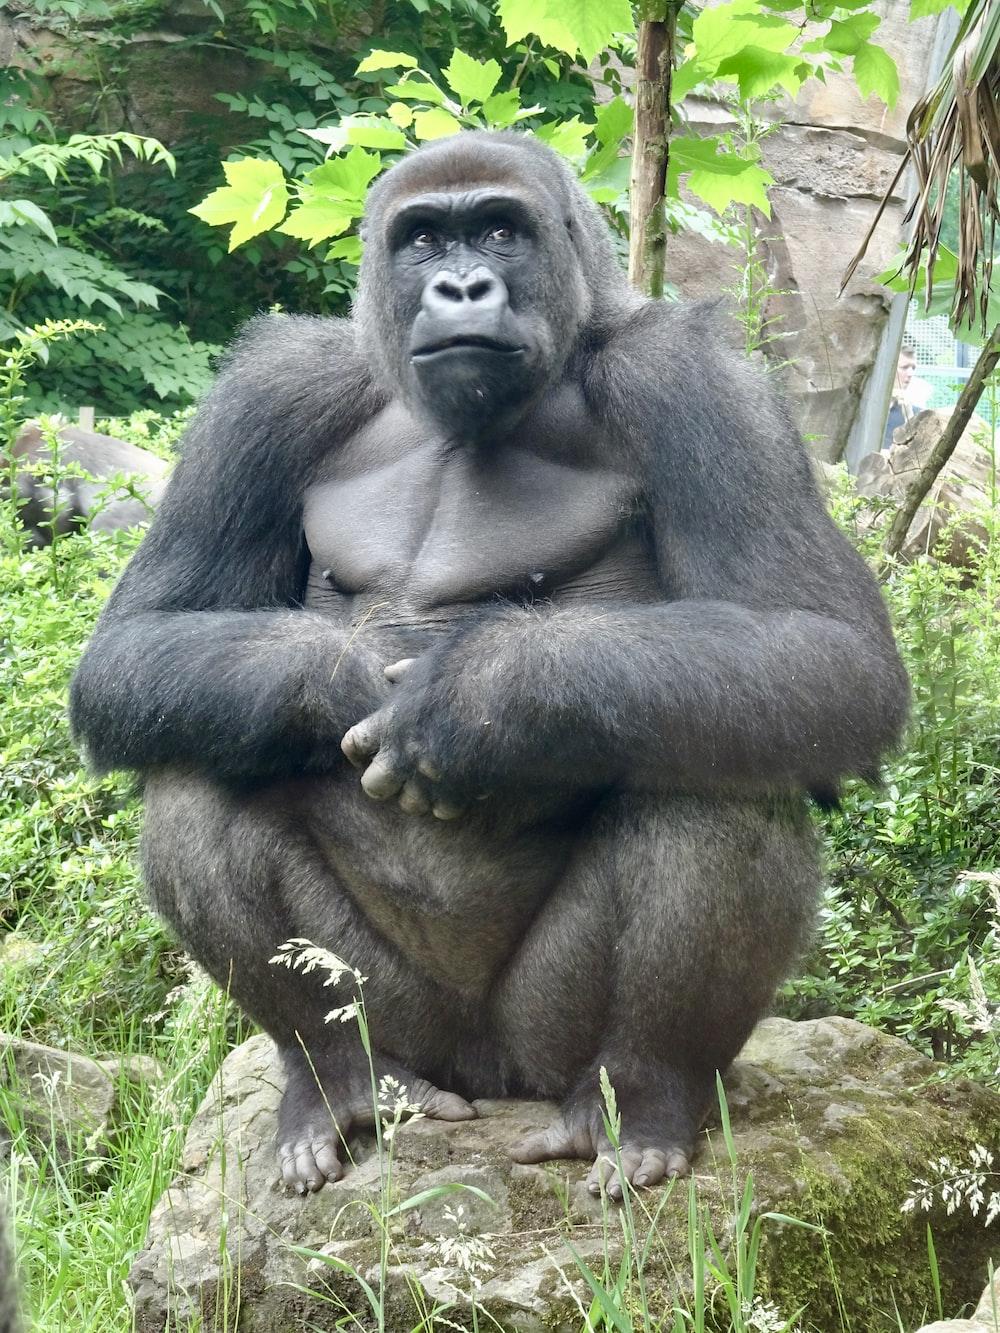 gorilla sitting on green grass during daytime